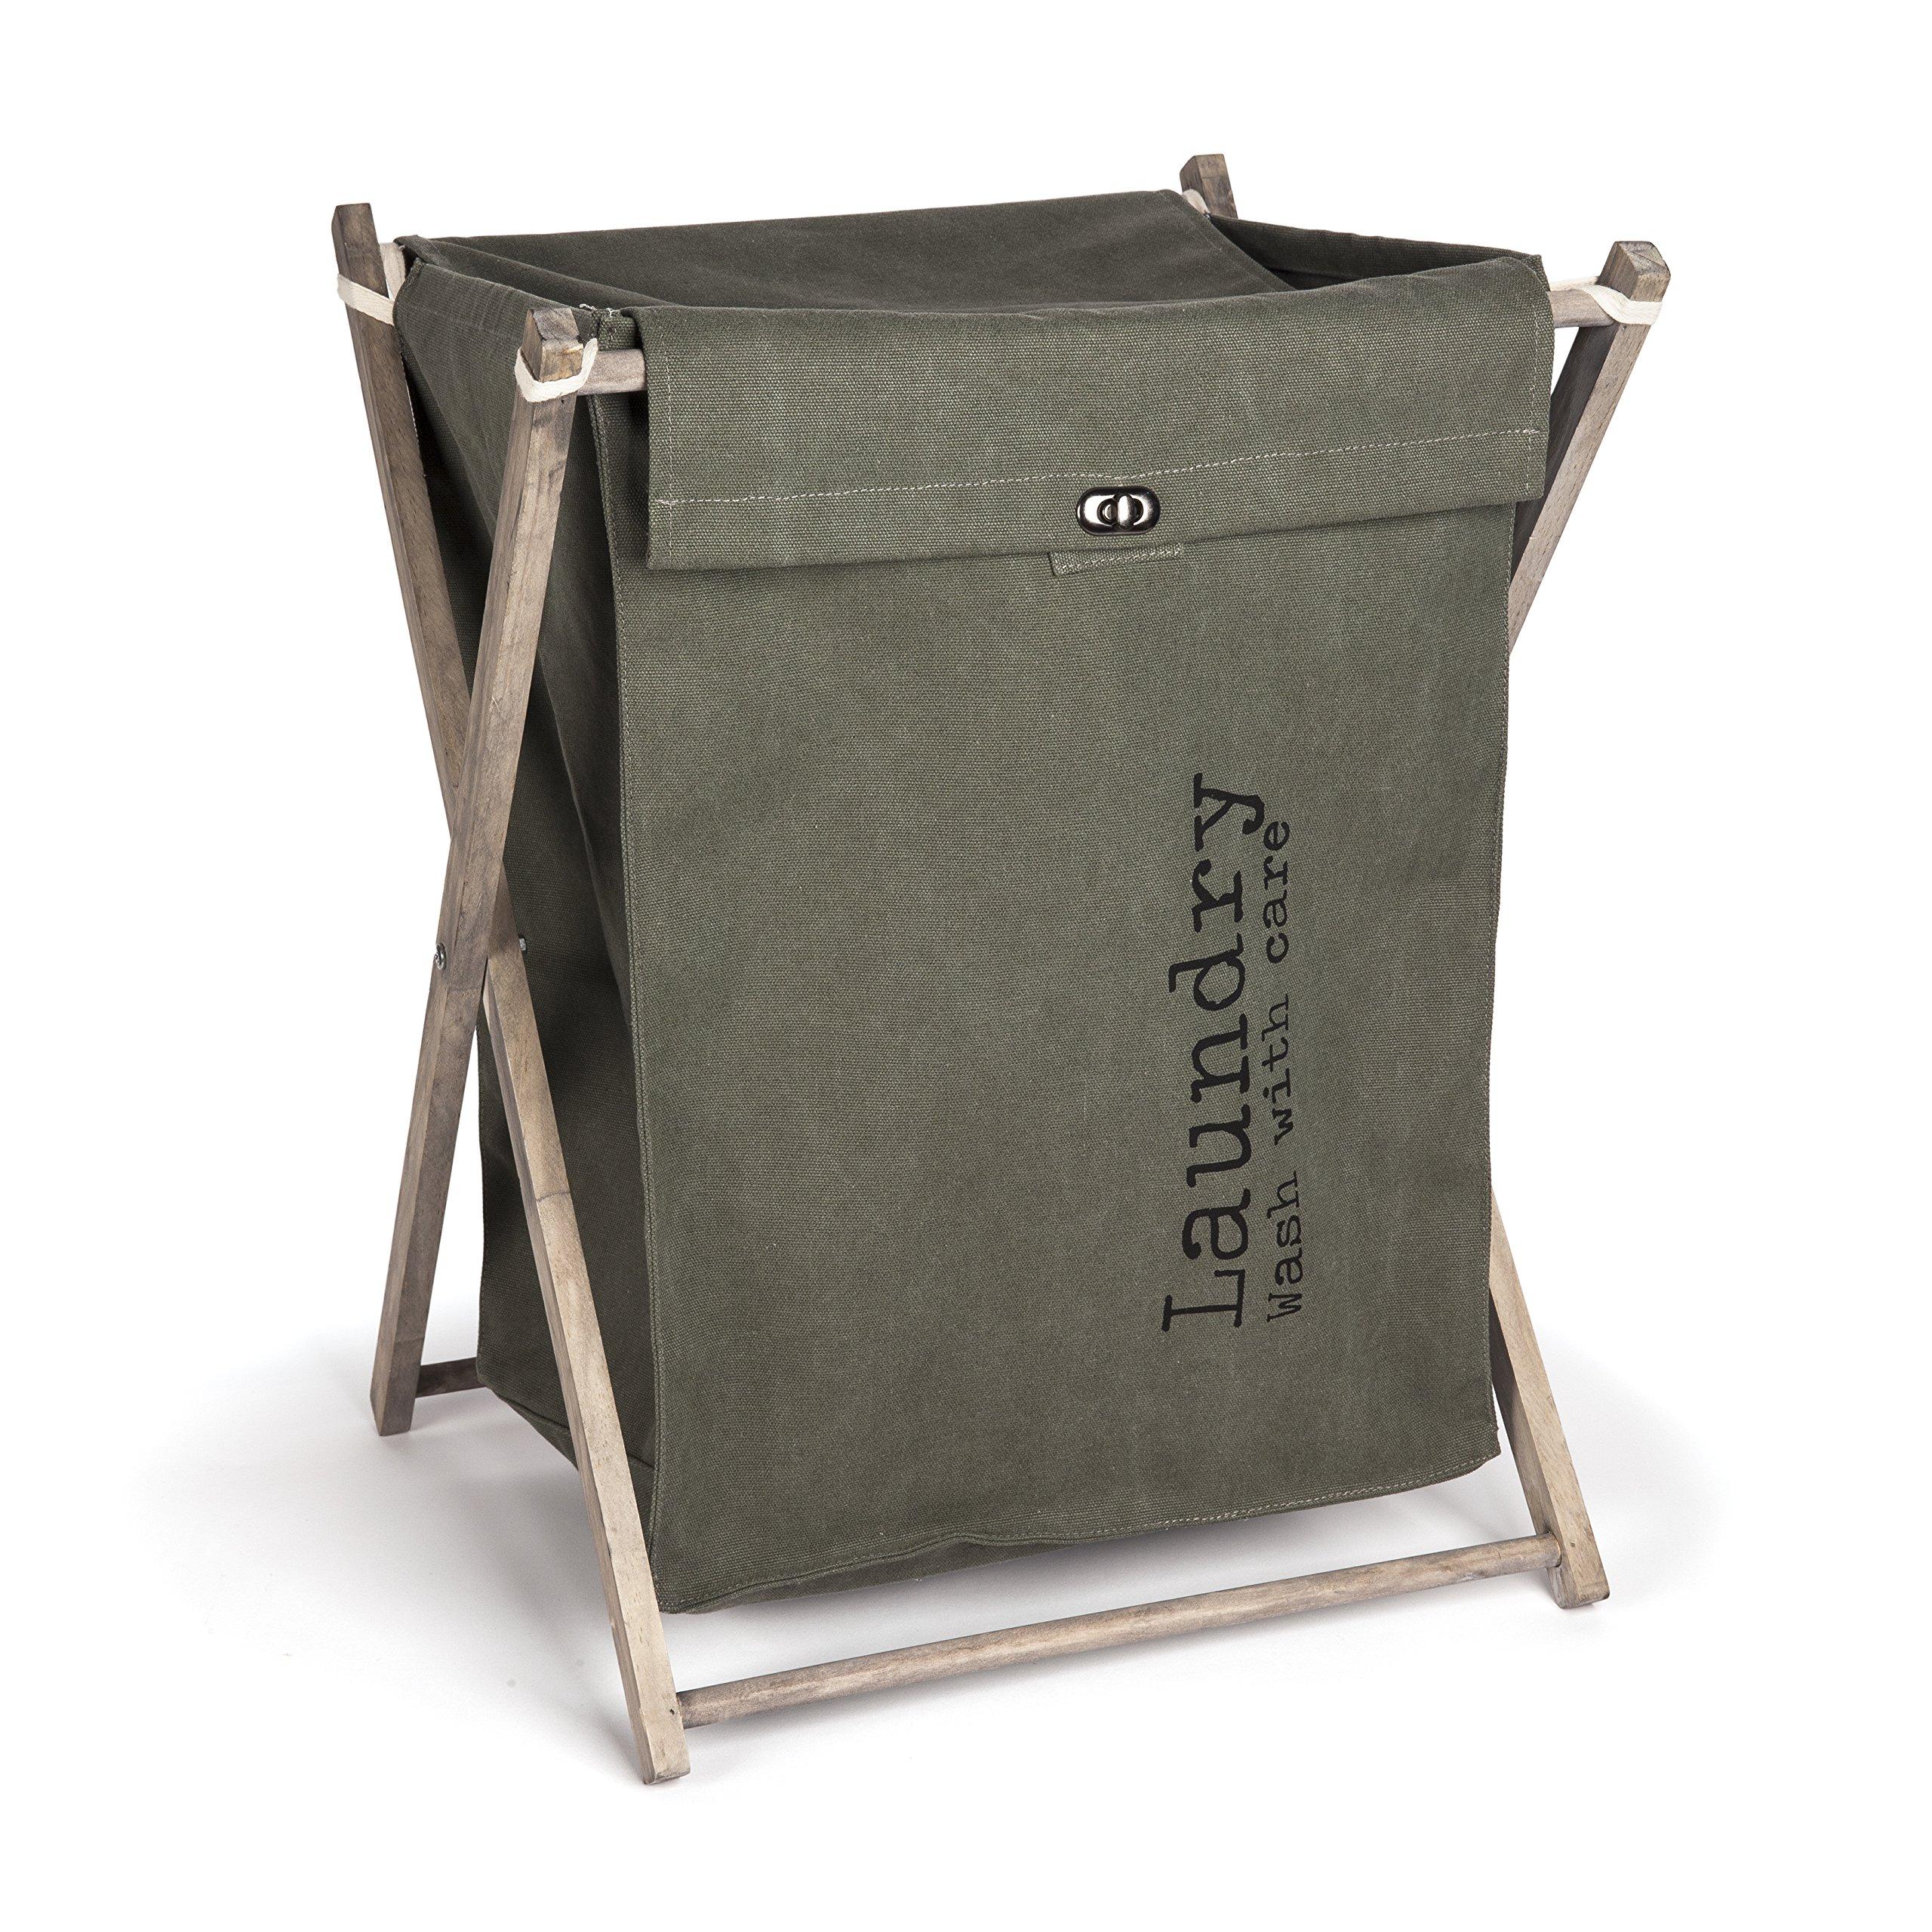 Danya B. Army Canvas Folding Laundry Hamper